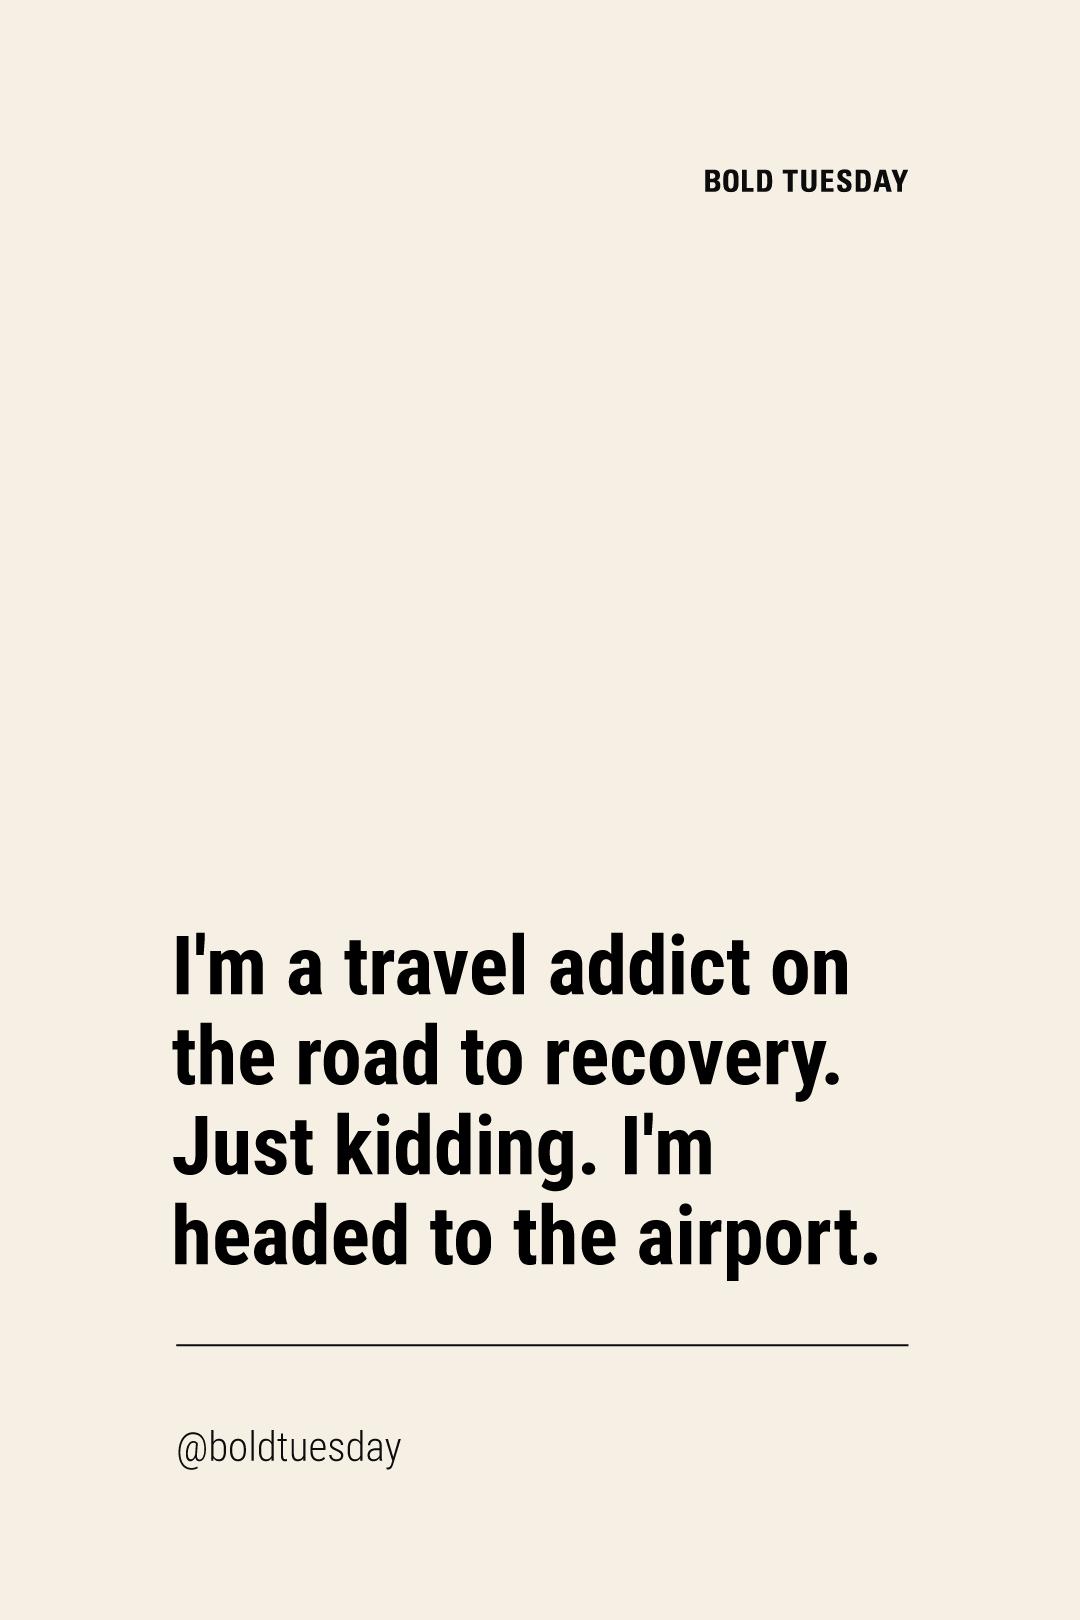 100 Original Travel Quotes That Make You Laugh Funny Travel Quotes Travel Quotes Vacation Quotes